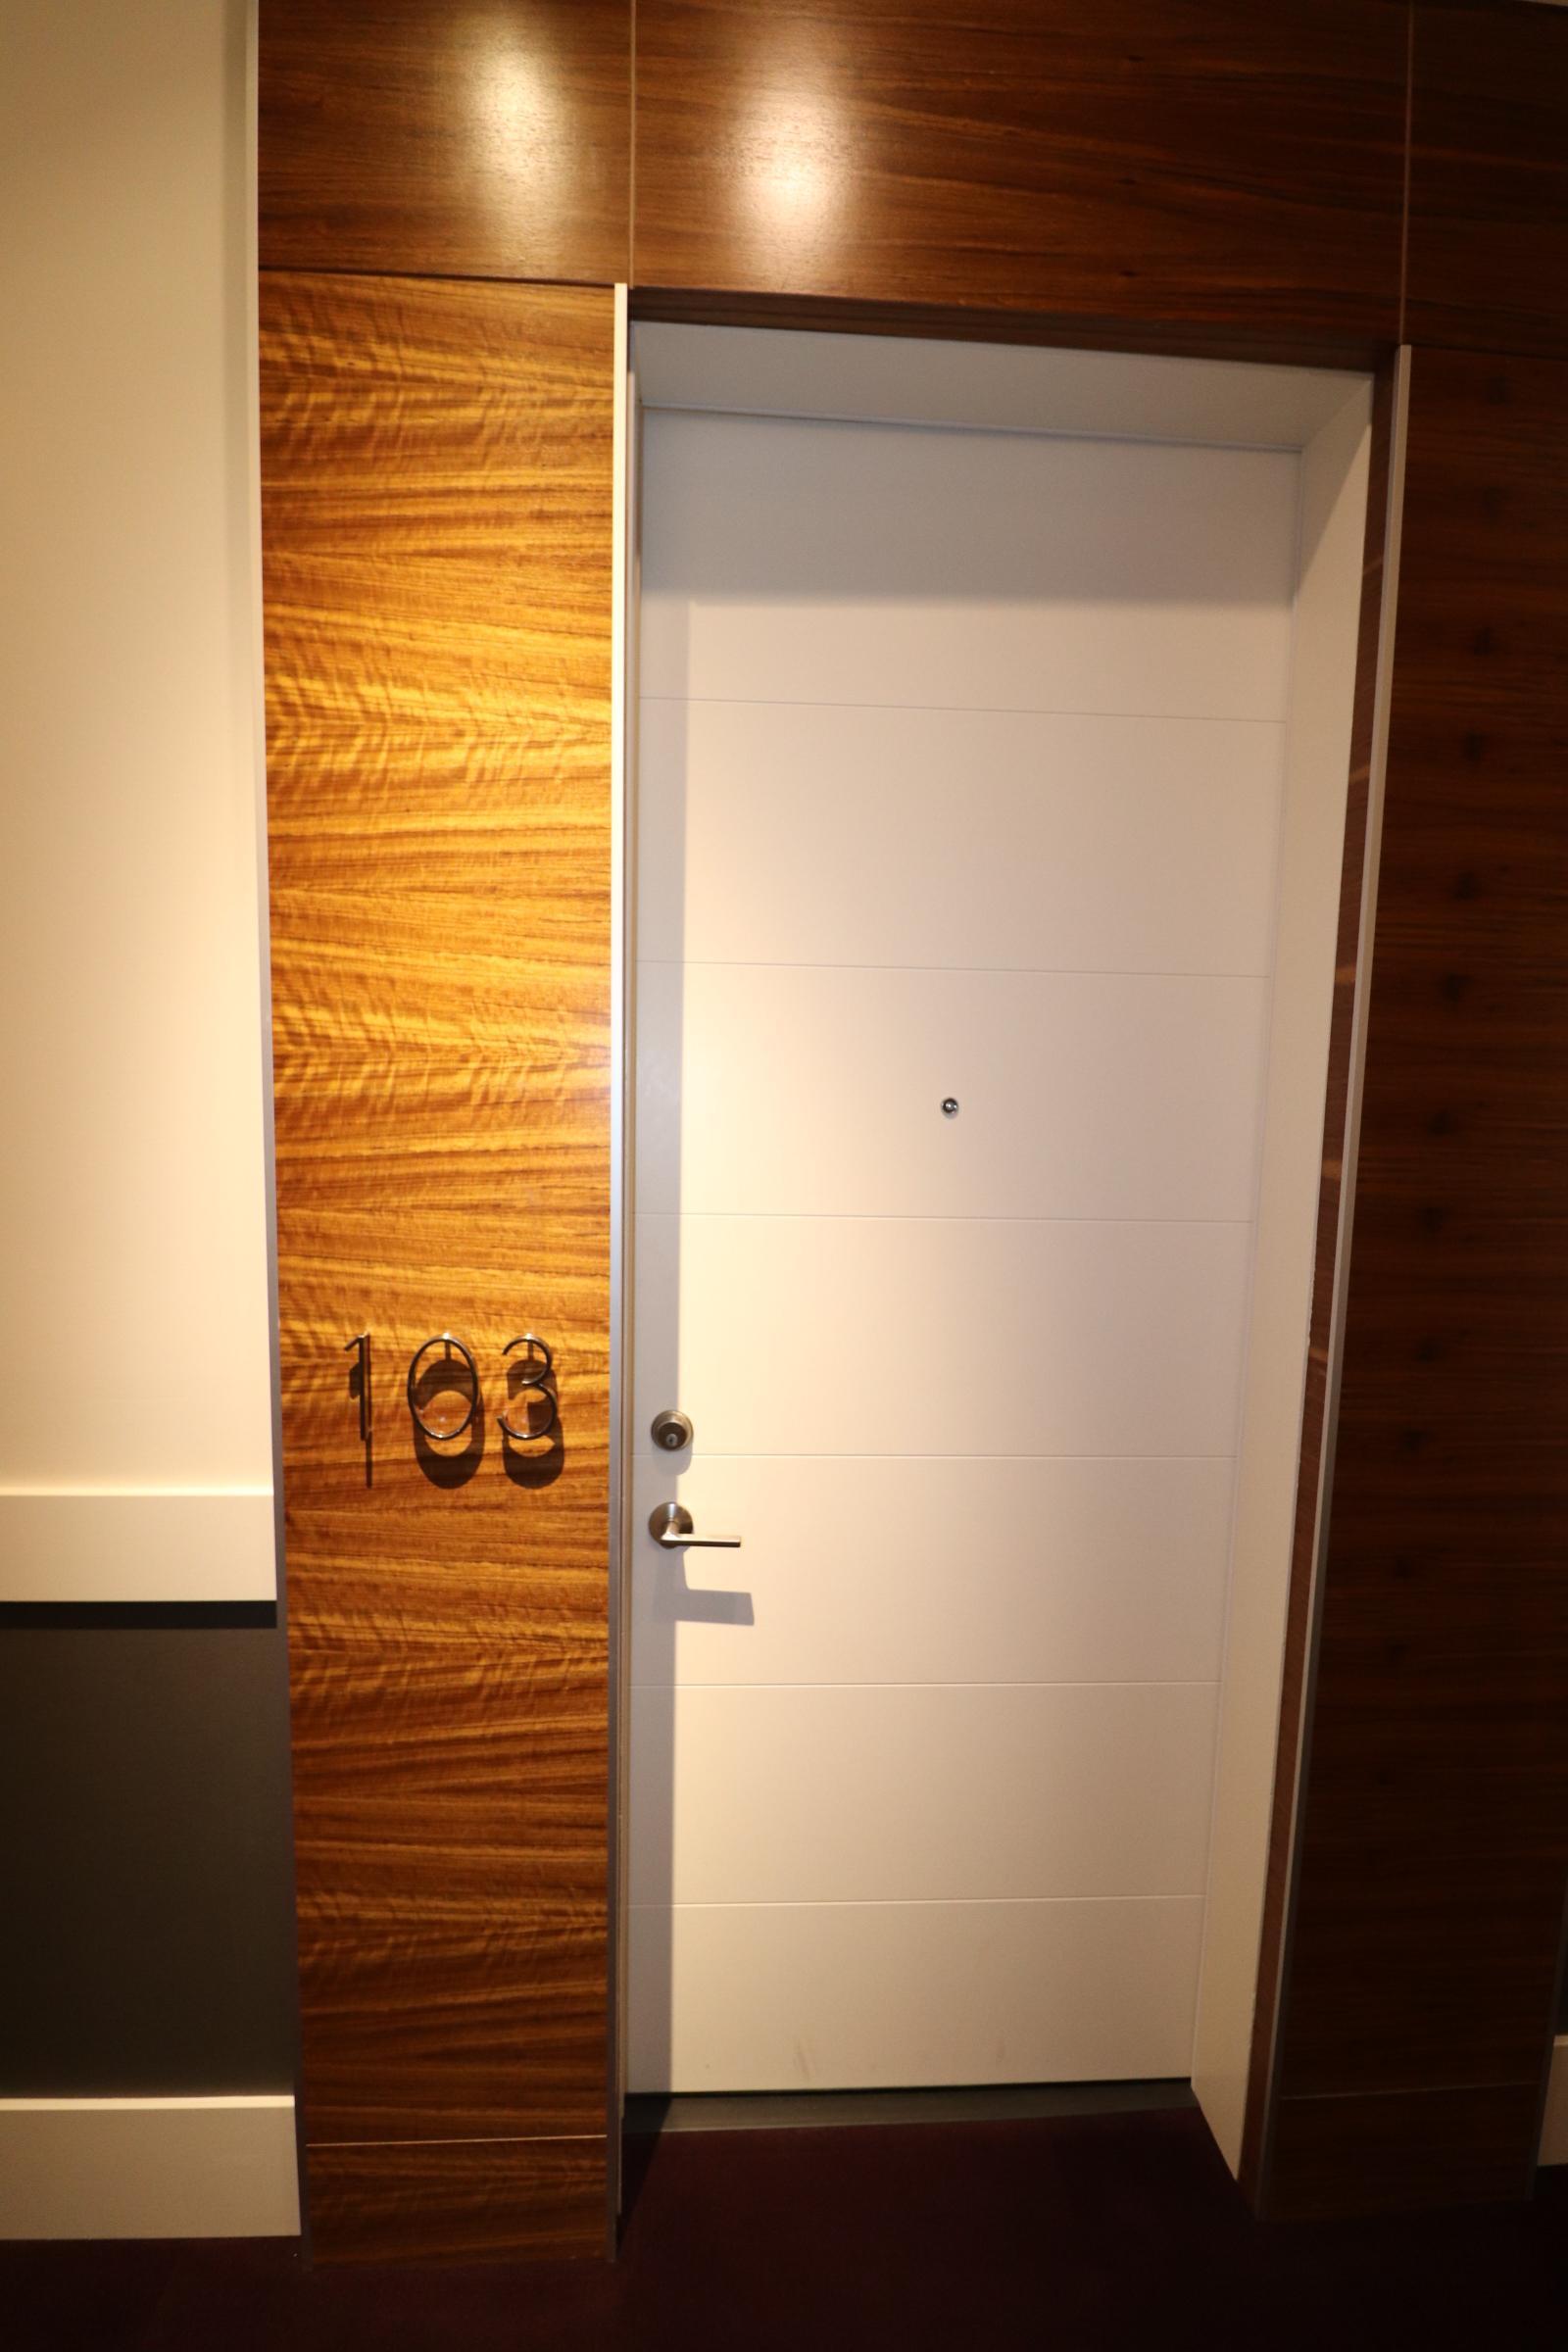 103, 12 Mahogany Path SE, Calgary, Alberta, 1 Bedroom Bedrooms, ,1 BathroomBathrooms,Condo,For Rent,Mahogany Path,103,1098